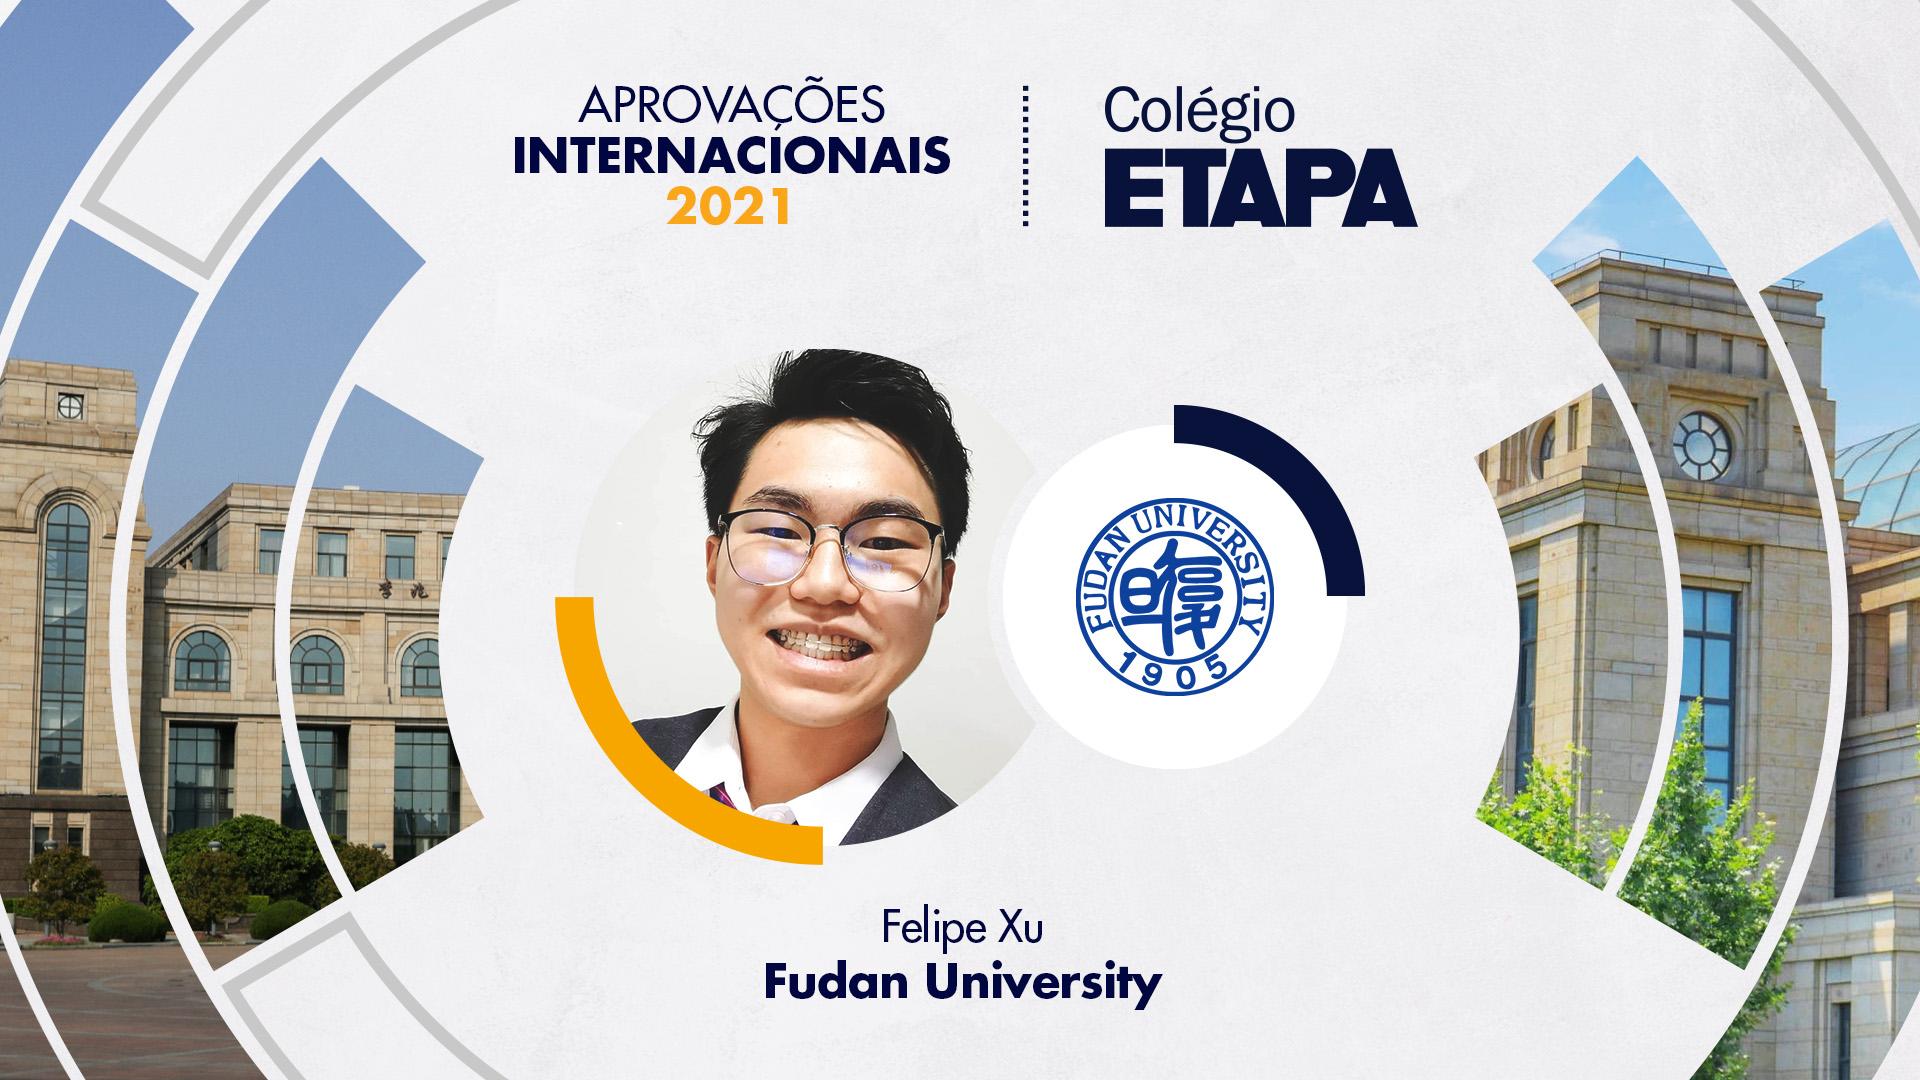 Felipe Xu vai estudar Negócios em Fudan University.